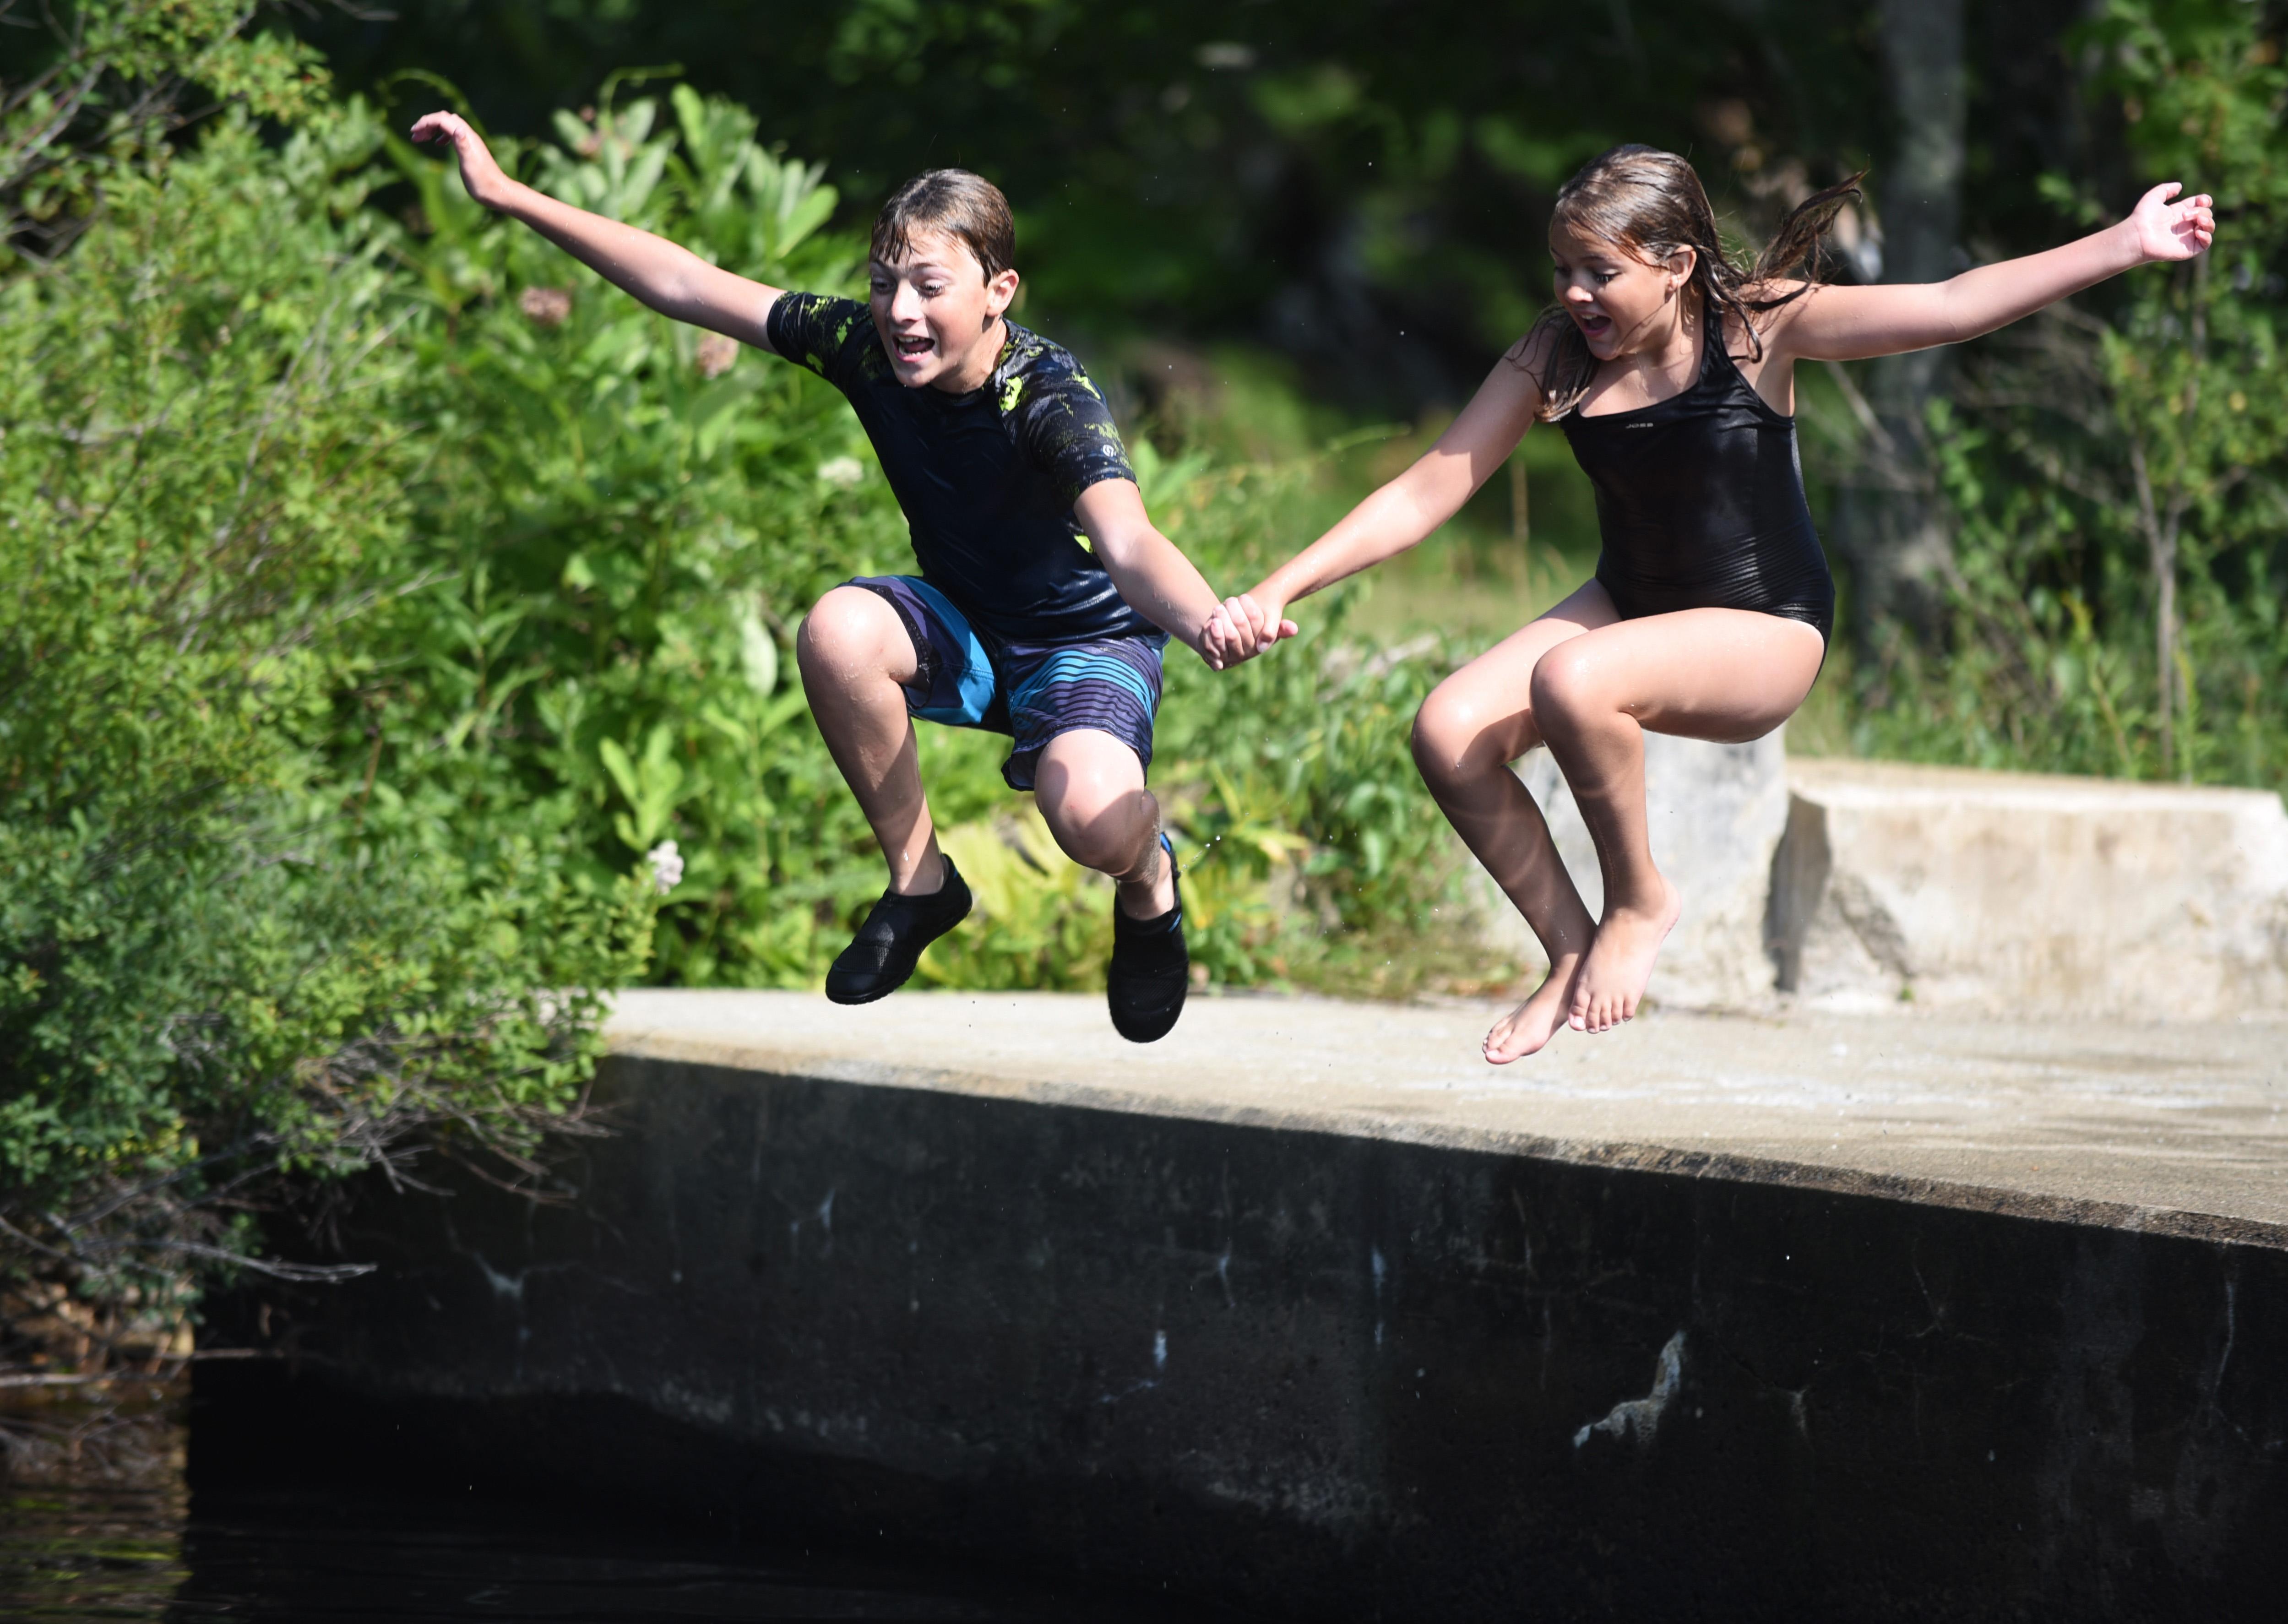 Logan Murff, 13, and Kellan Murff, 10, jump off the platform at the Bristol Mills Dam on Wednesday, July 11. (Jessica Picard photo)